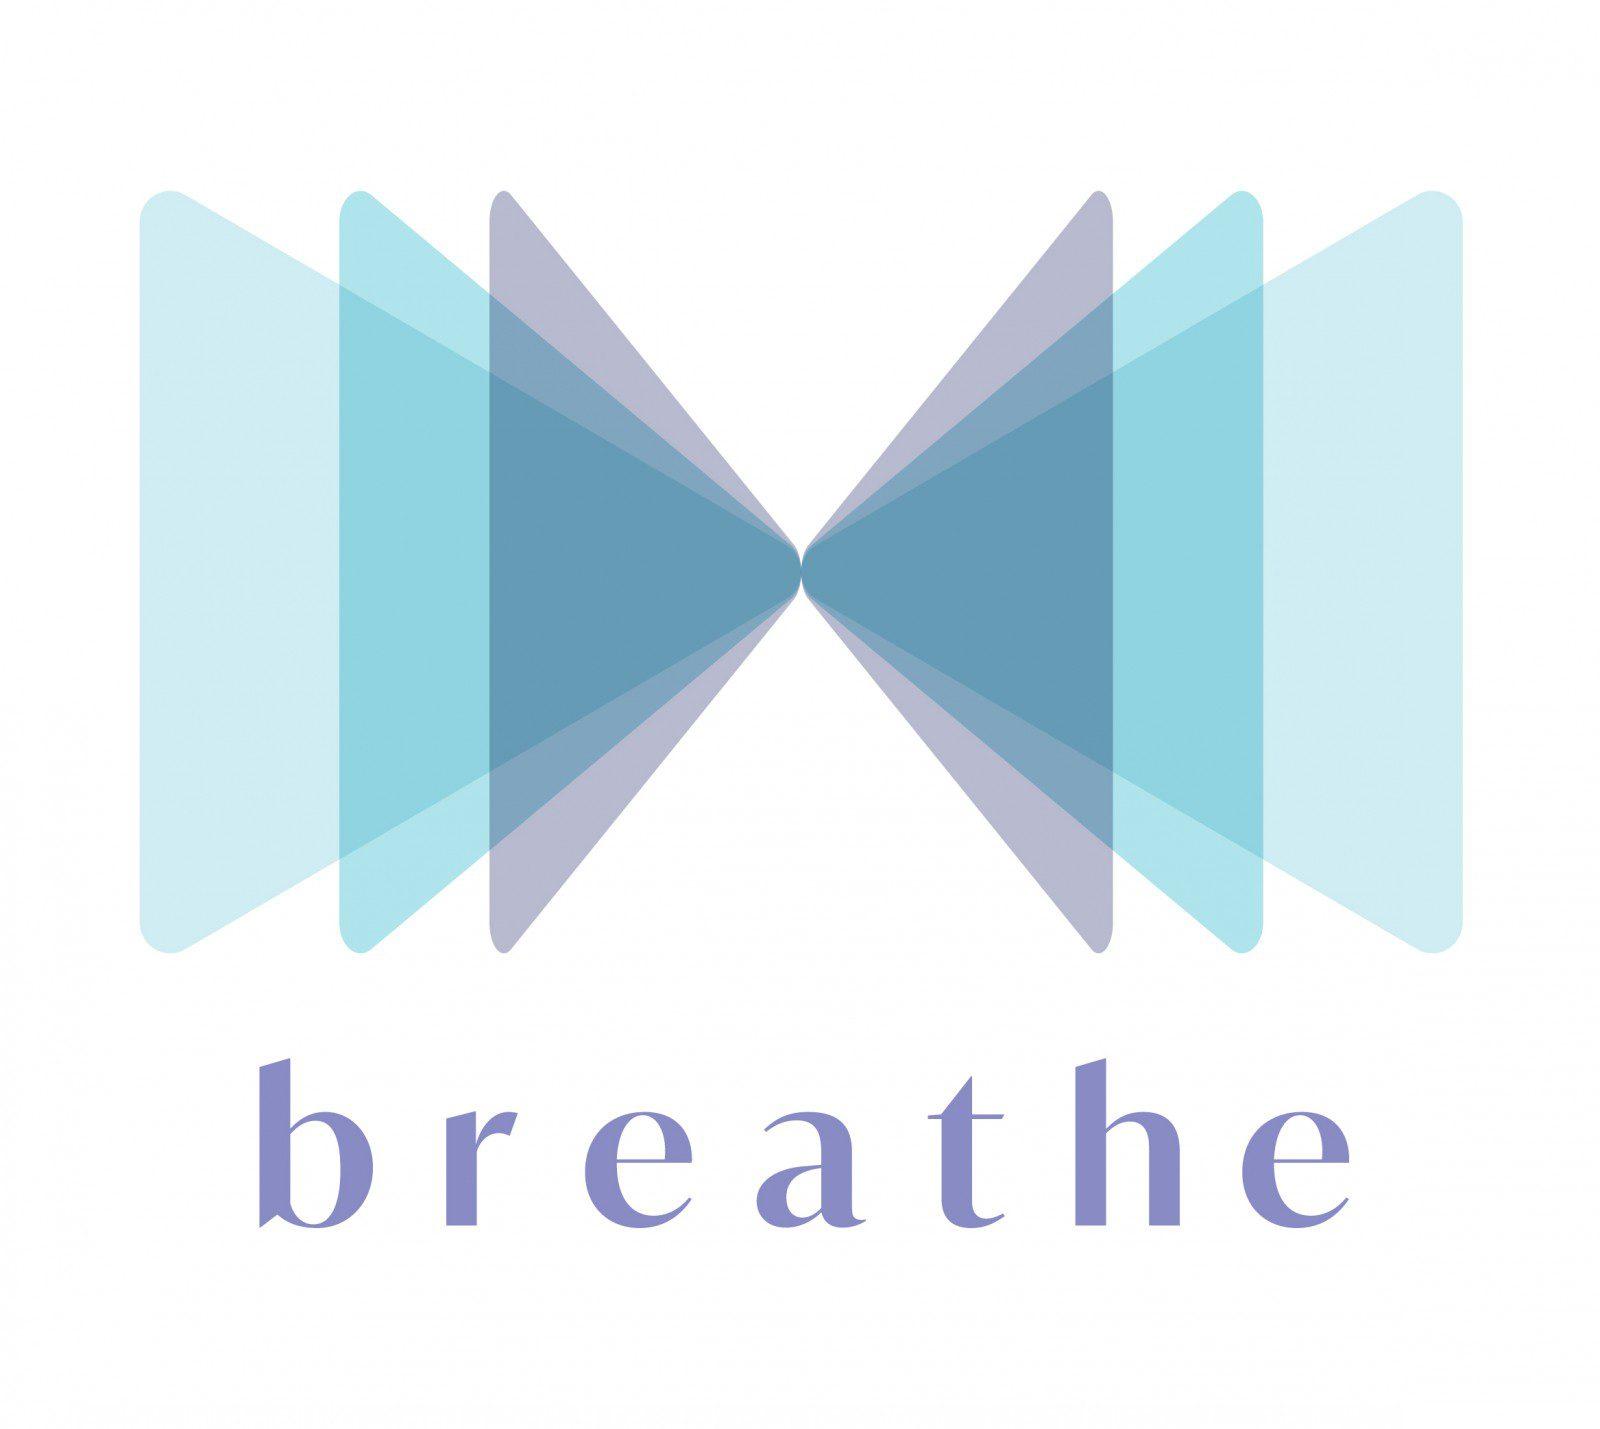 24th Annual Model Exhibit: Breathe